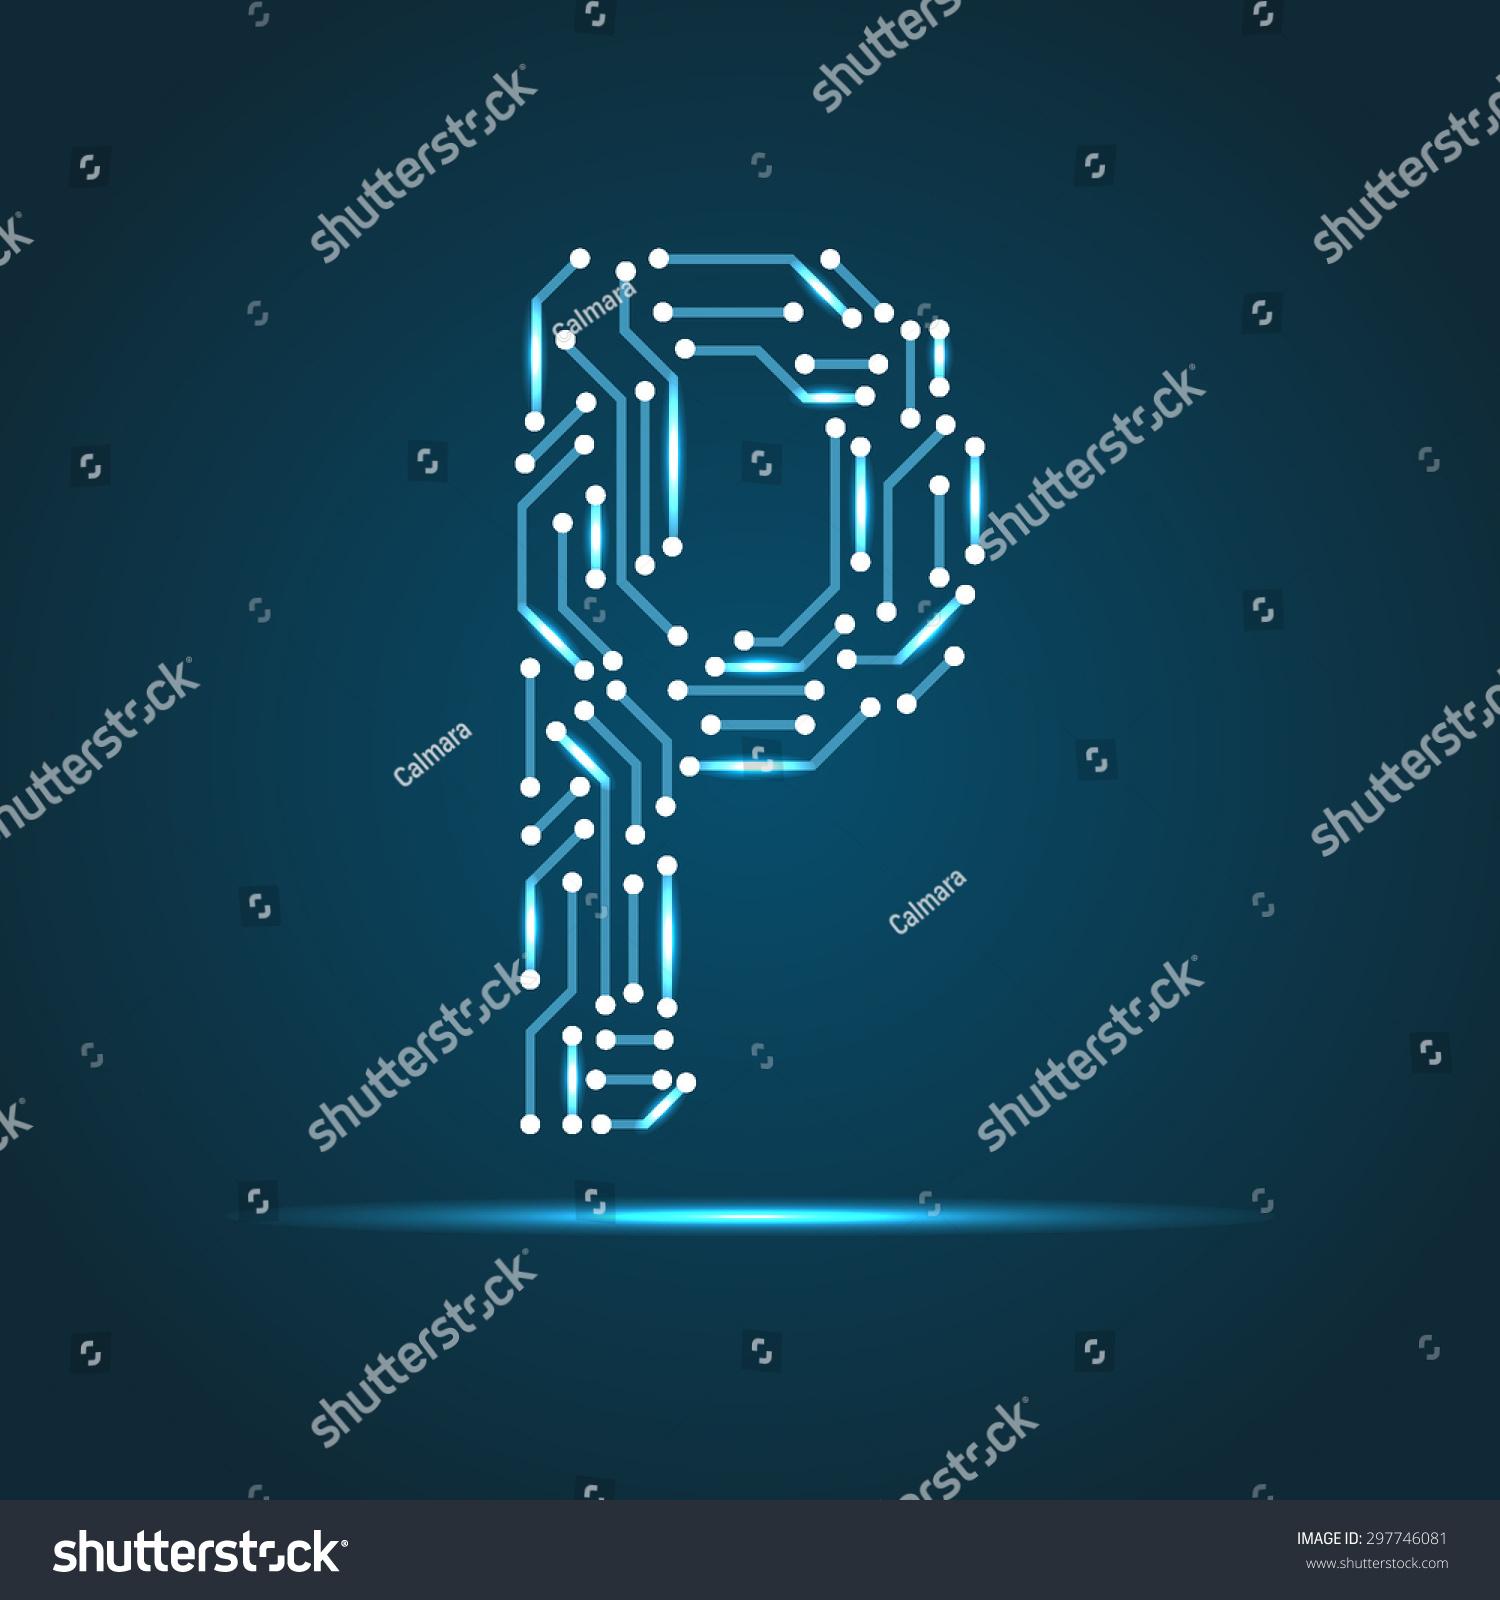 Vector letter p logo sign symbol stock vector 297746081 shutterstock vector letter p logo sign symbol icon design element technology biocorpaavc